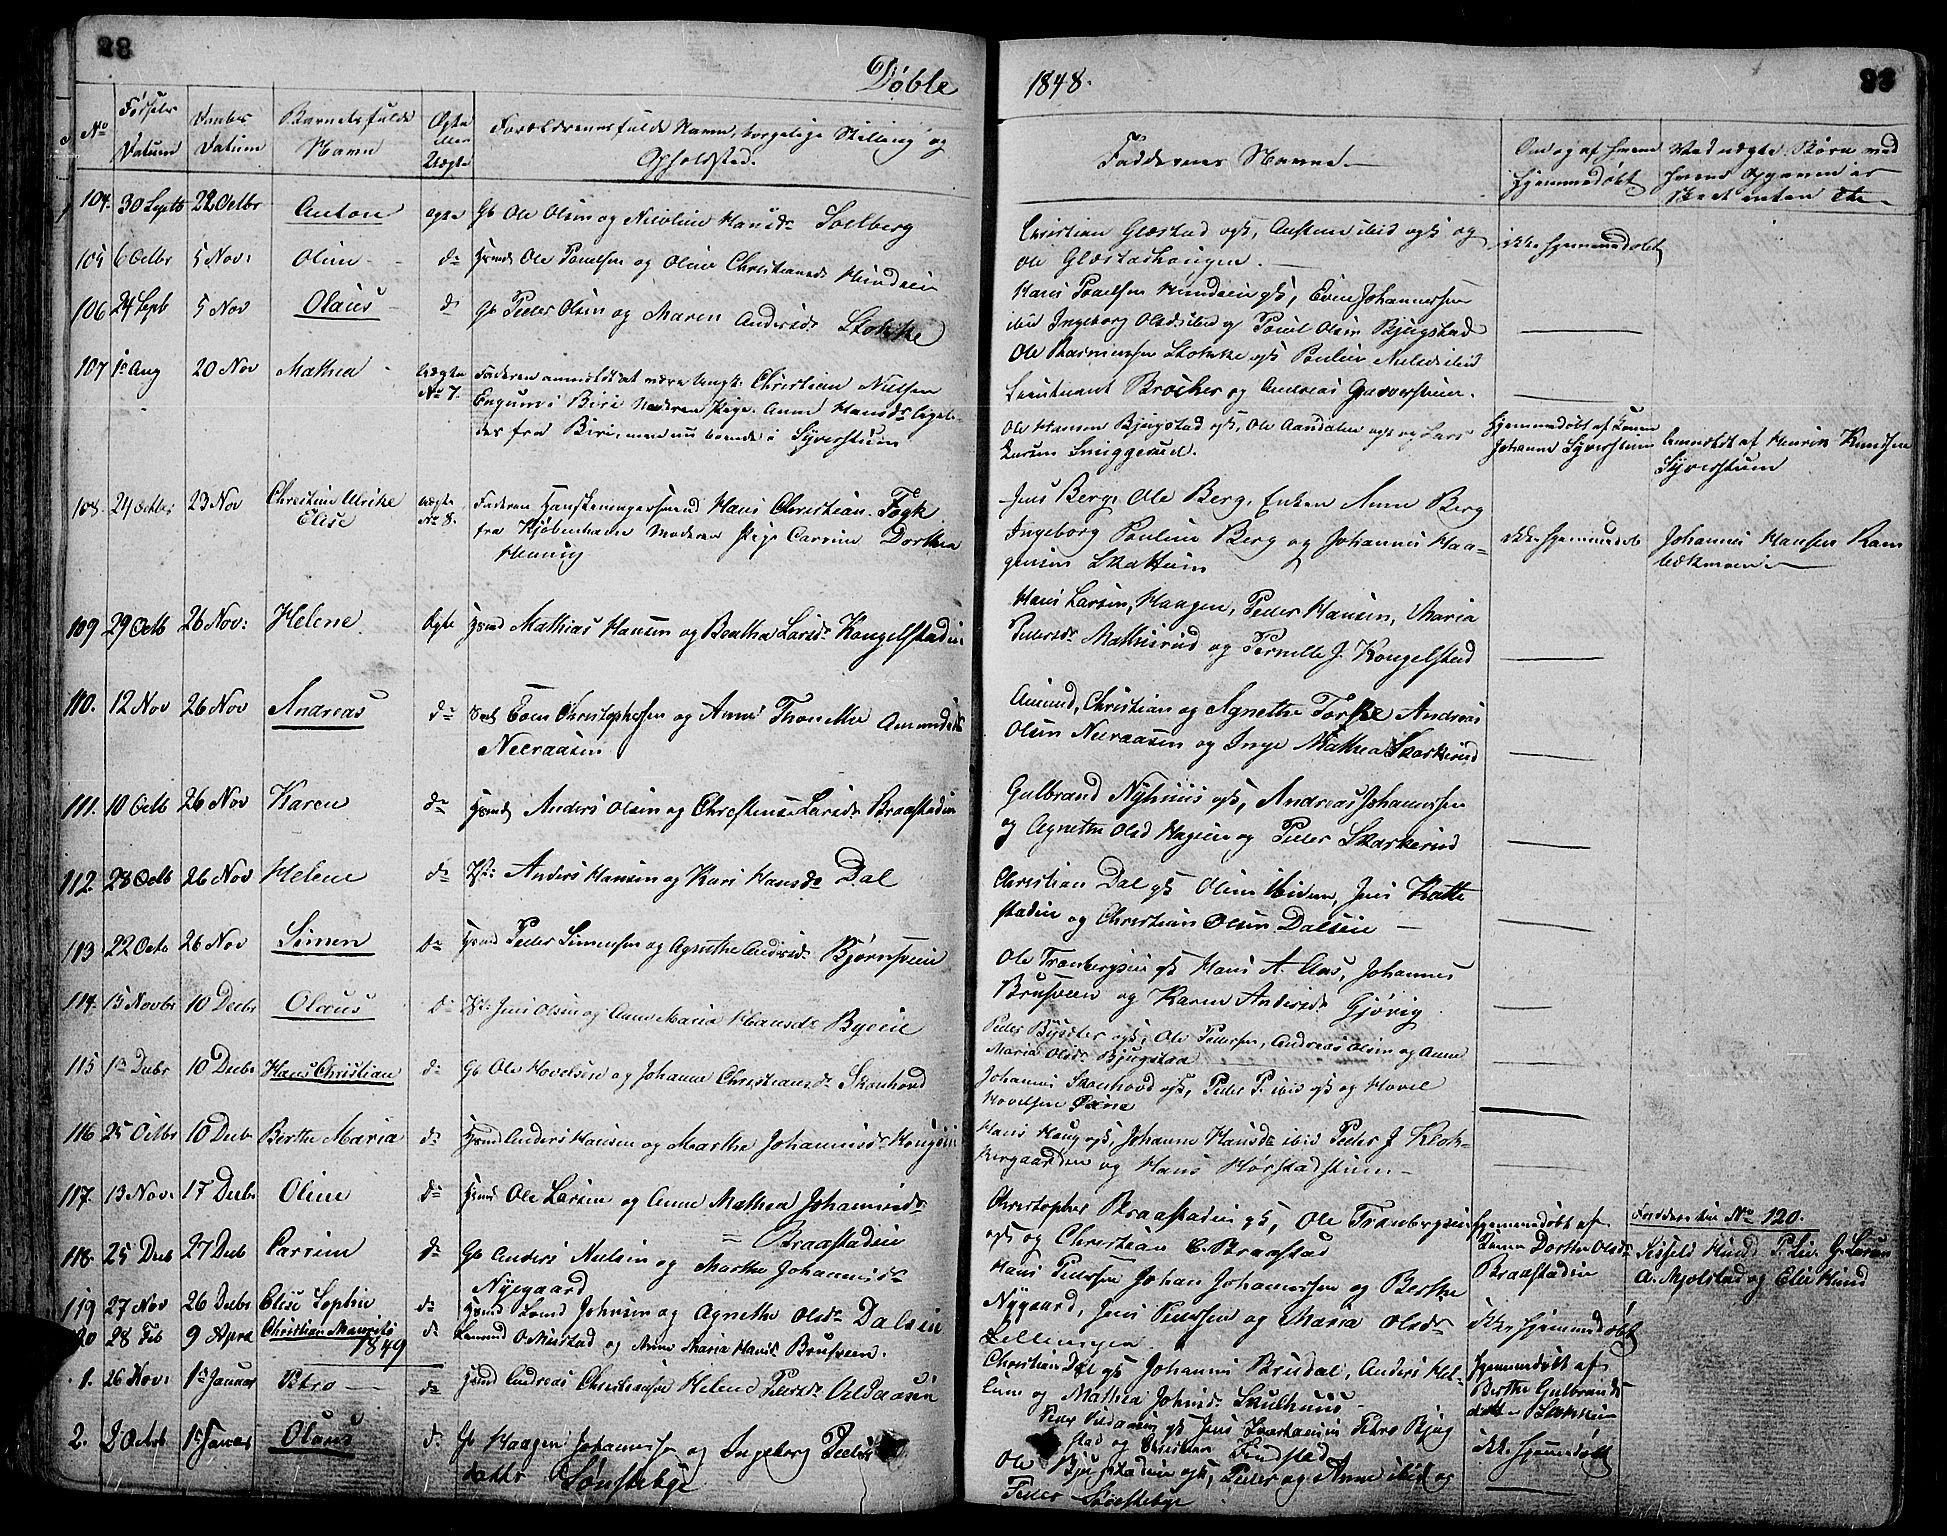 SAH, Vardal prestekontor, H/Ha/Hab/L0004: Klokkerbok nr. 4, 1831-1853, s. 83